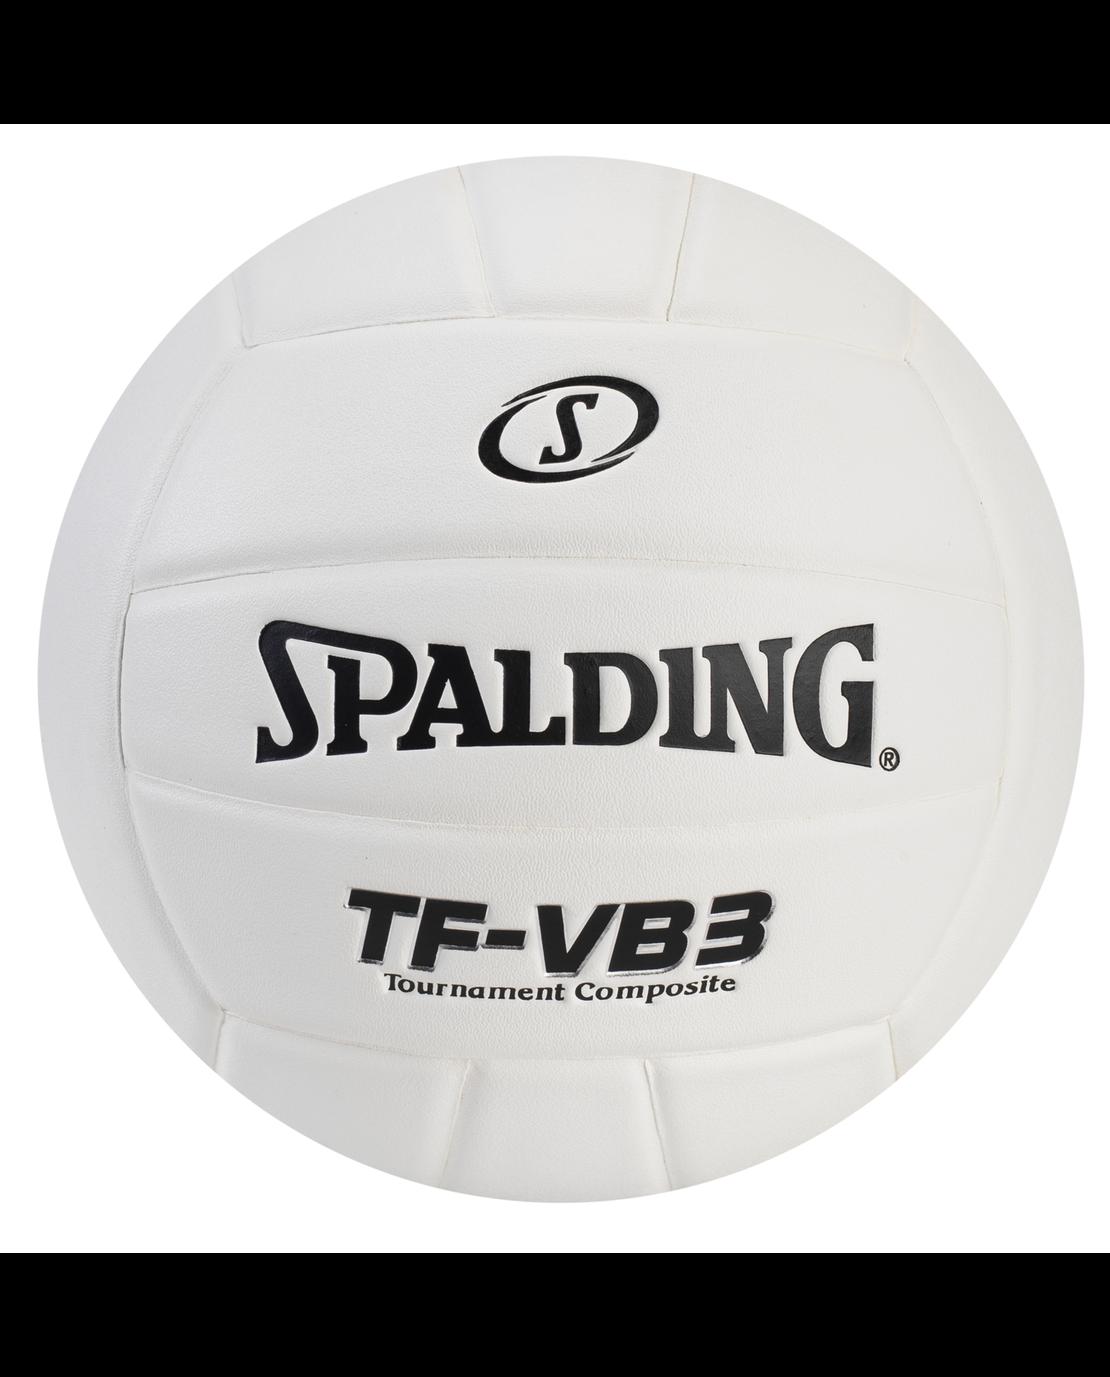 TF-VB3 VOLLEYBALL